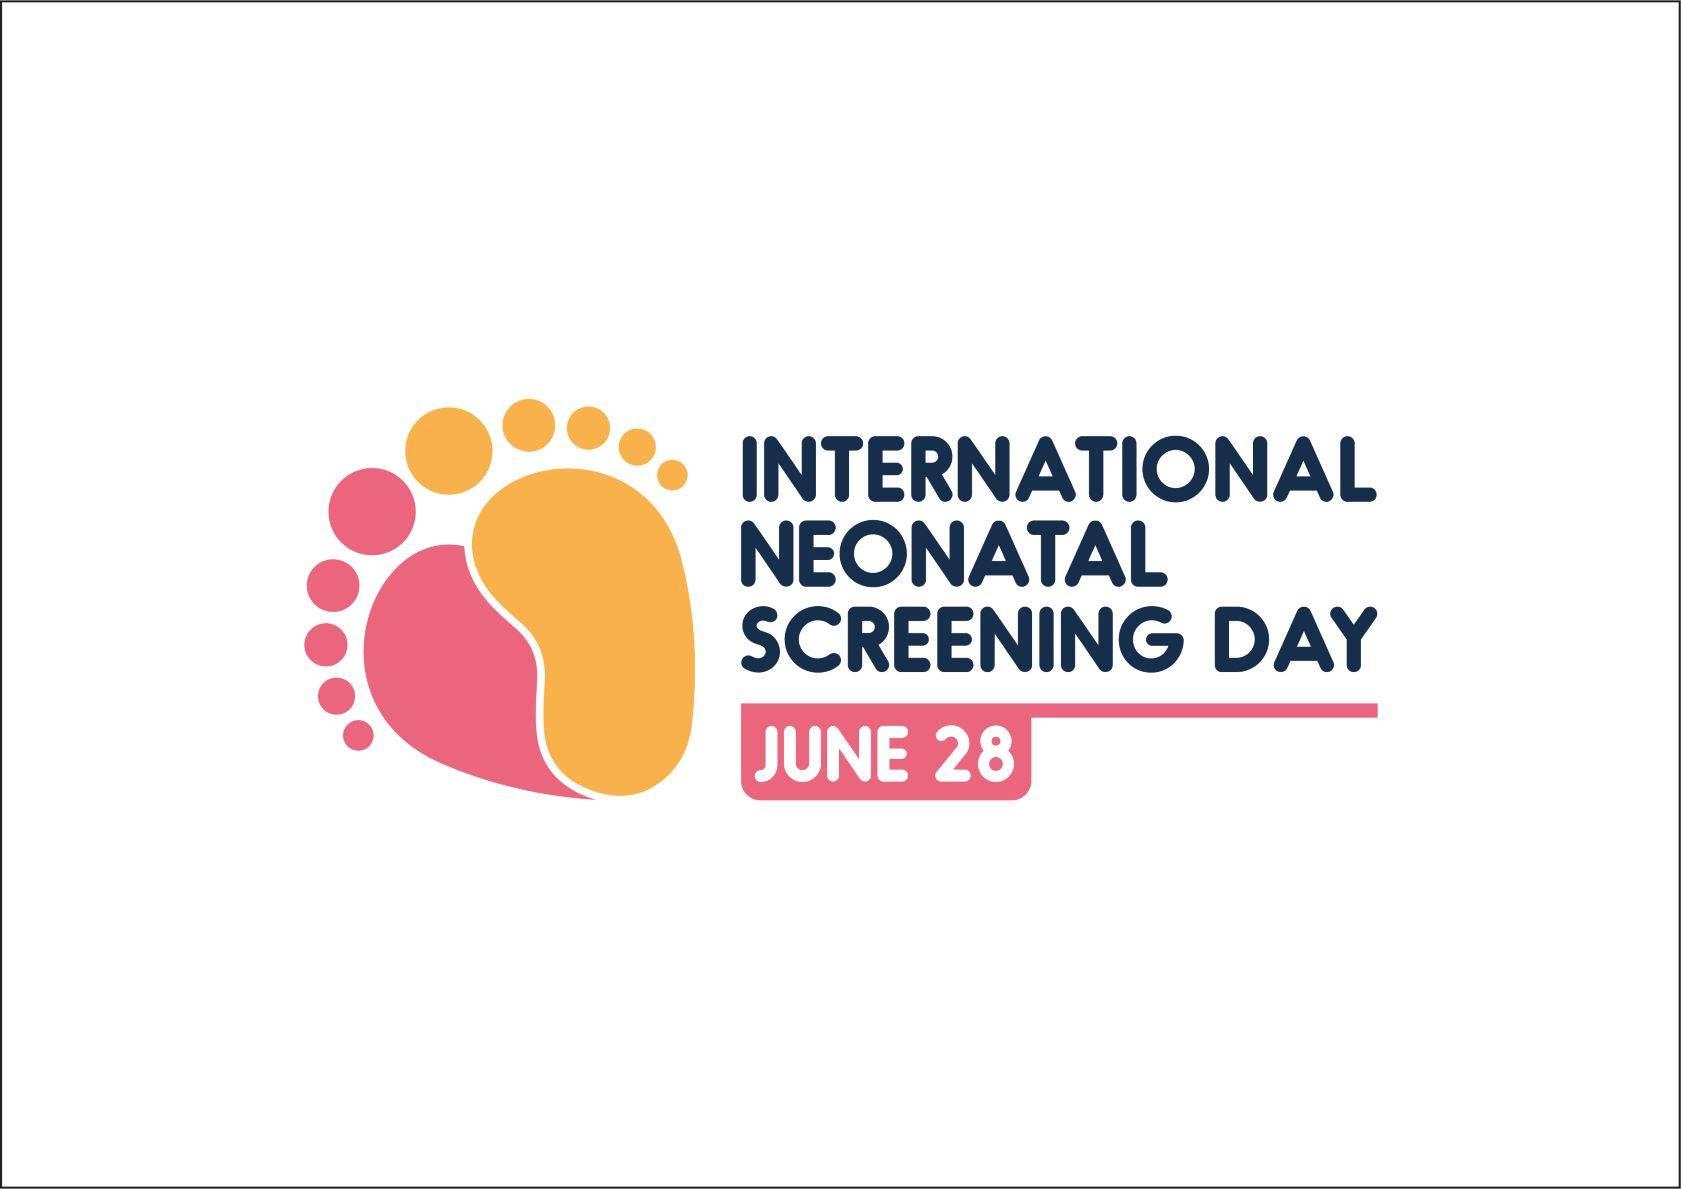 International Neonatal Screening Day